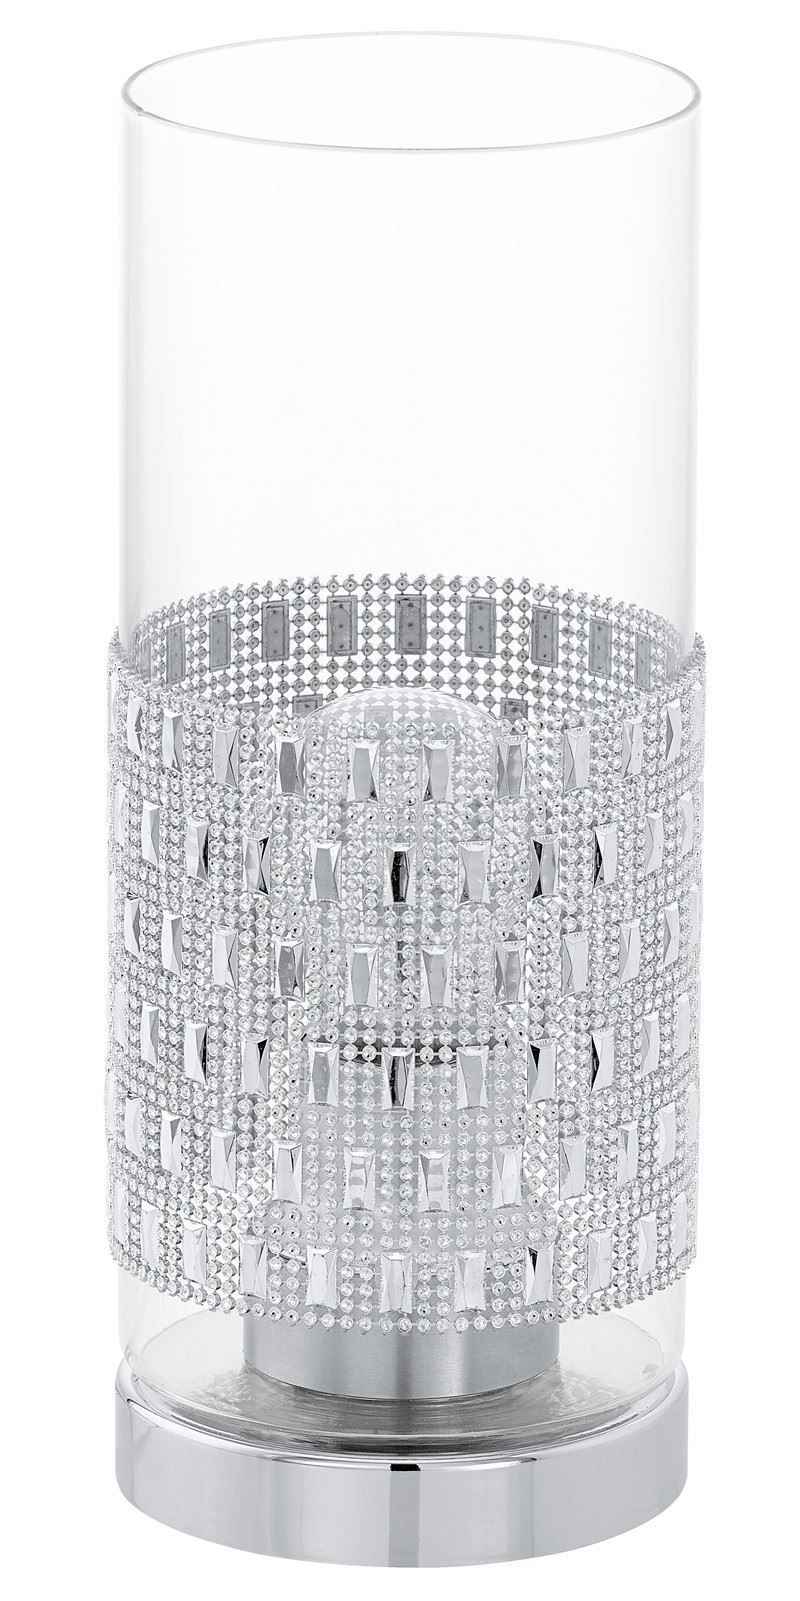 Torvisco Chrome Table Lamp 1 Light E27 Clear Glass Shade